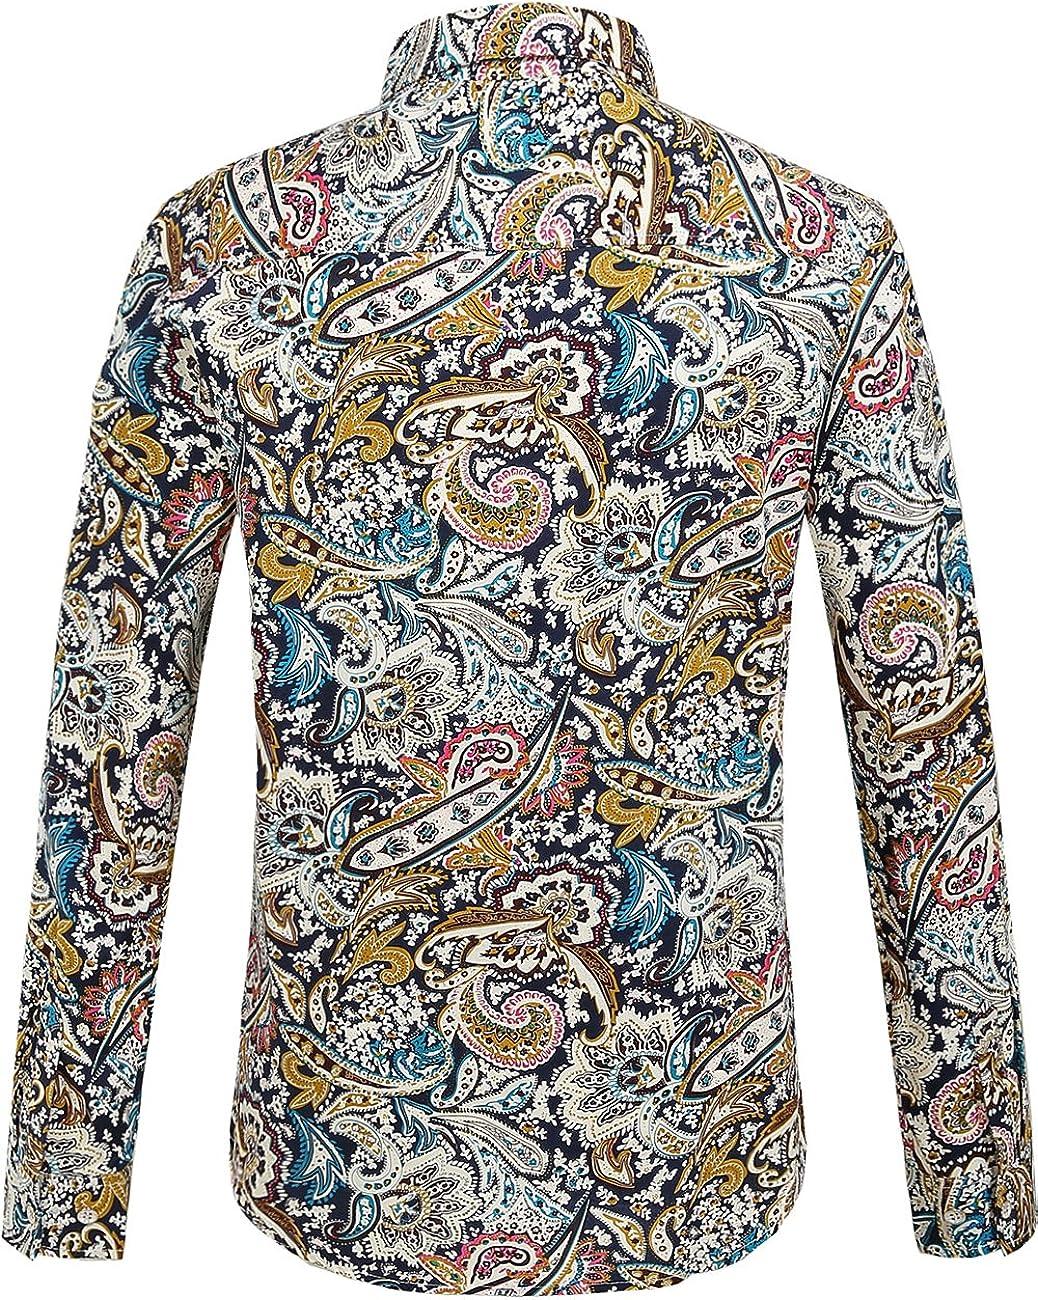 SSLR Camisa Estampado Cachemir Floral Manga Larga de Algod/ón de Hombre